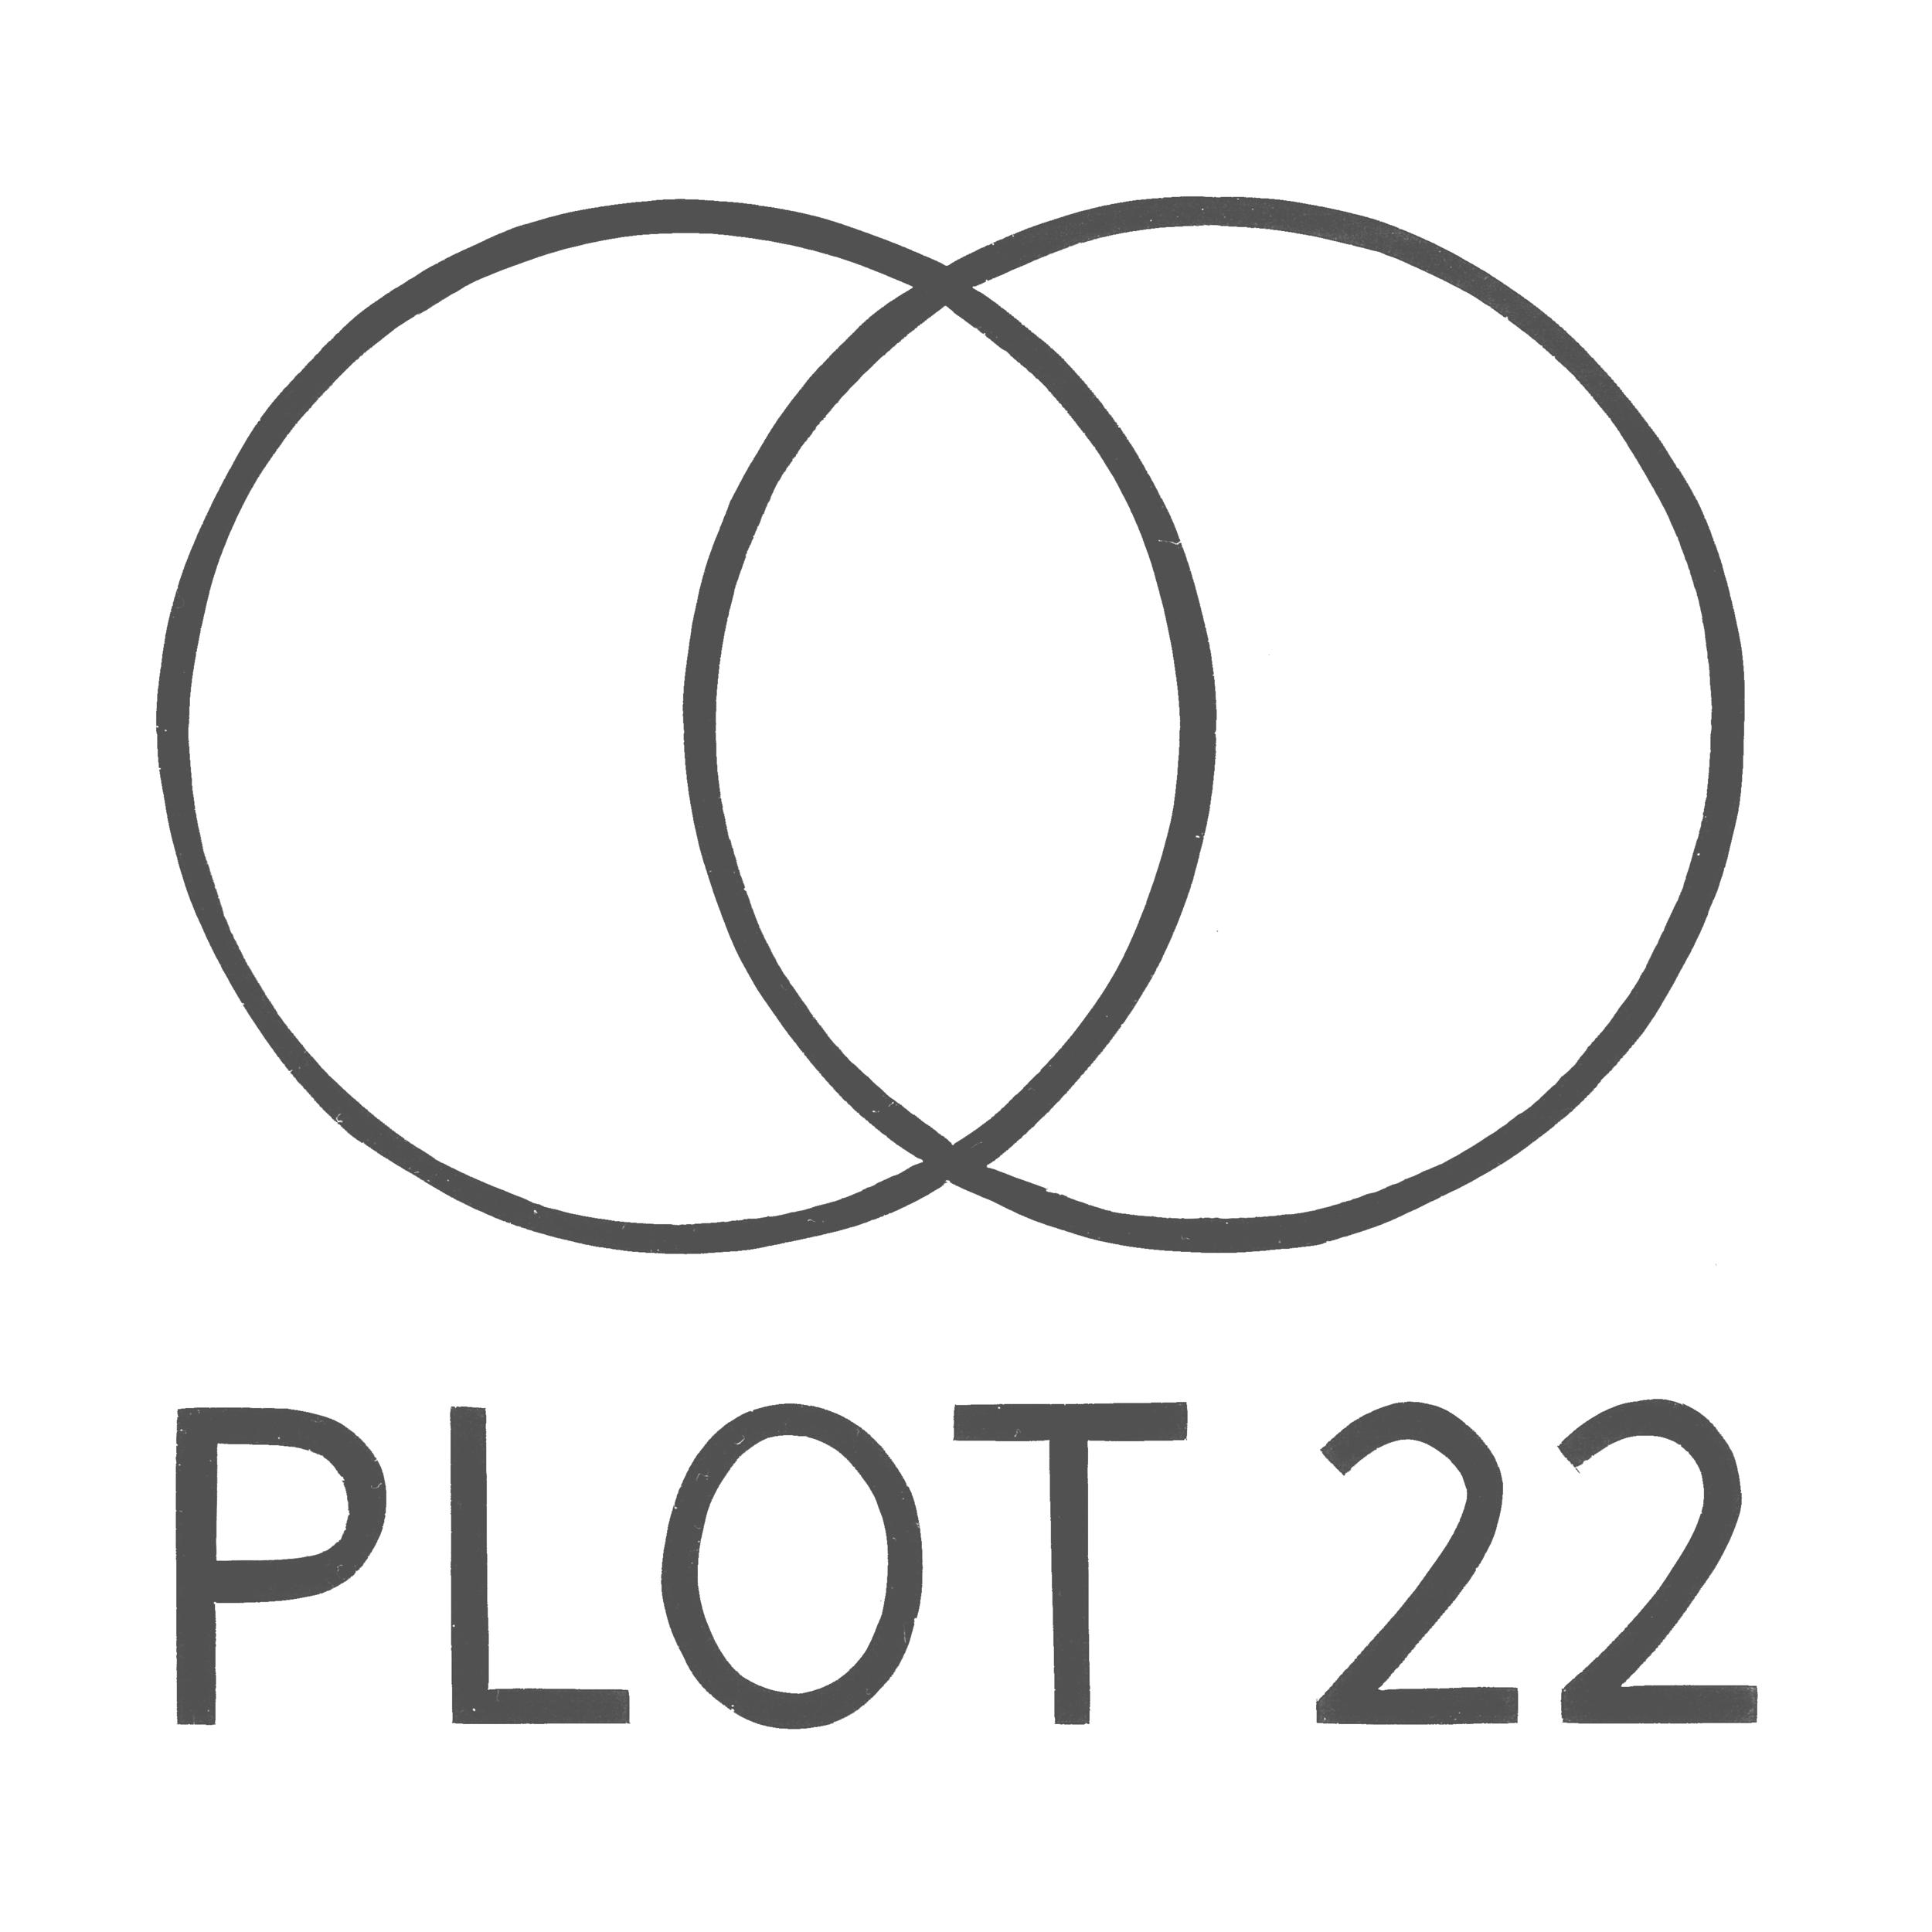 PLOT22-Handcut-GreyOnWhite.png